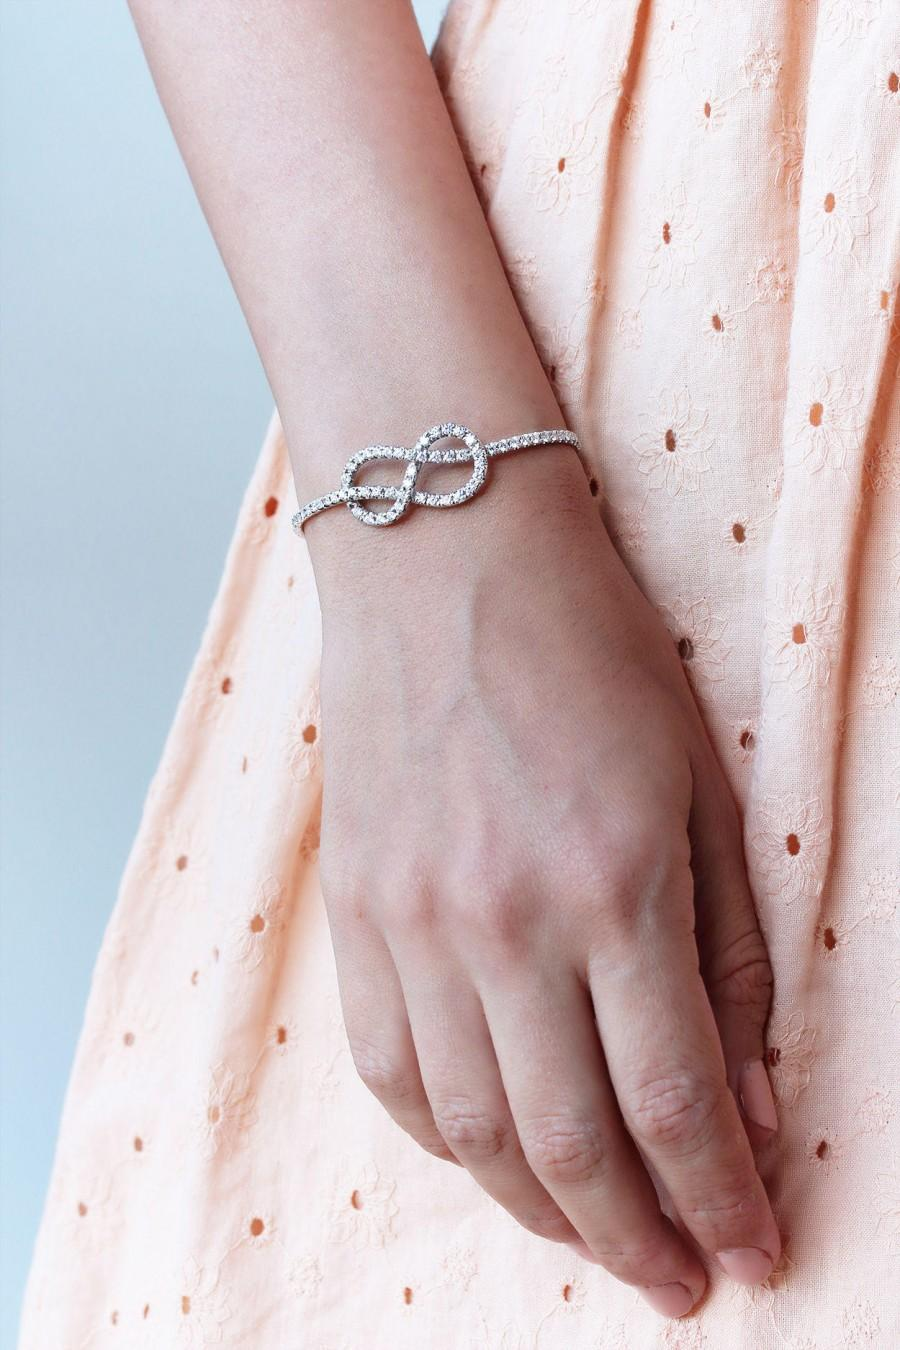 Wedding - Infinity Knot Diamond Tennis Bracelet; Diamond Infinity BangleBracelet; Diamond Cuff Bracelet, Knot Bracelet 14K/18K Rose/Yellow/White Gold - $3322.00 USD